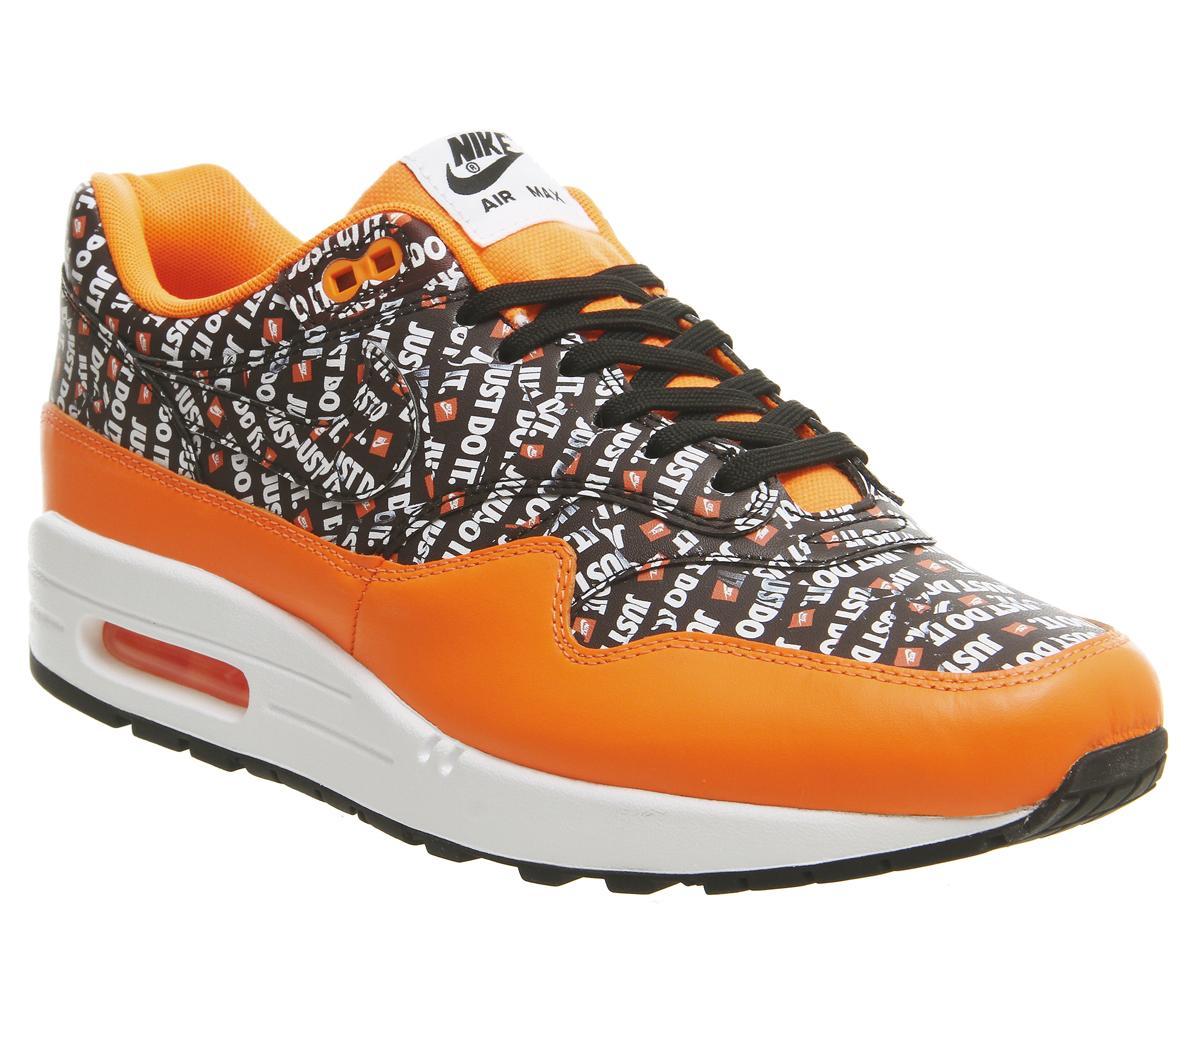 Nike Air Max 1 Trainers Total Orange